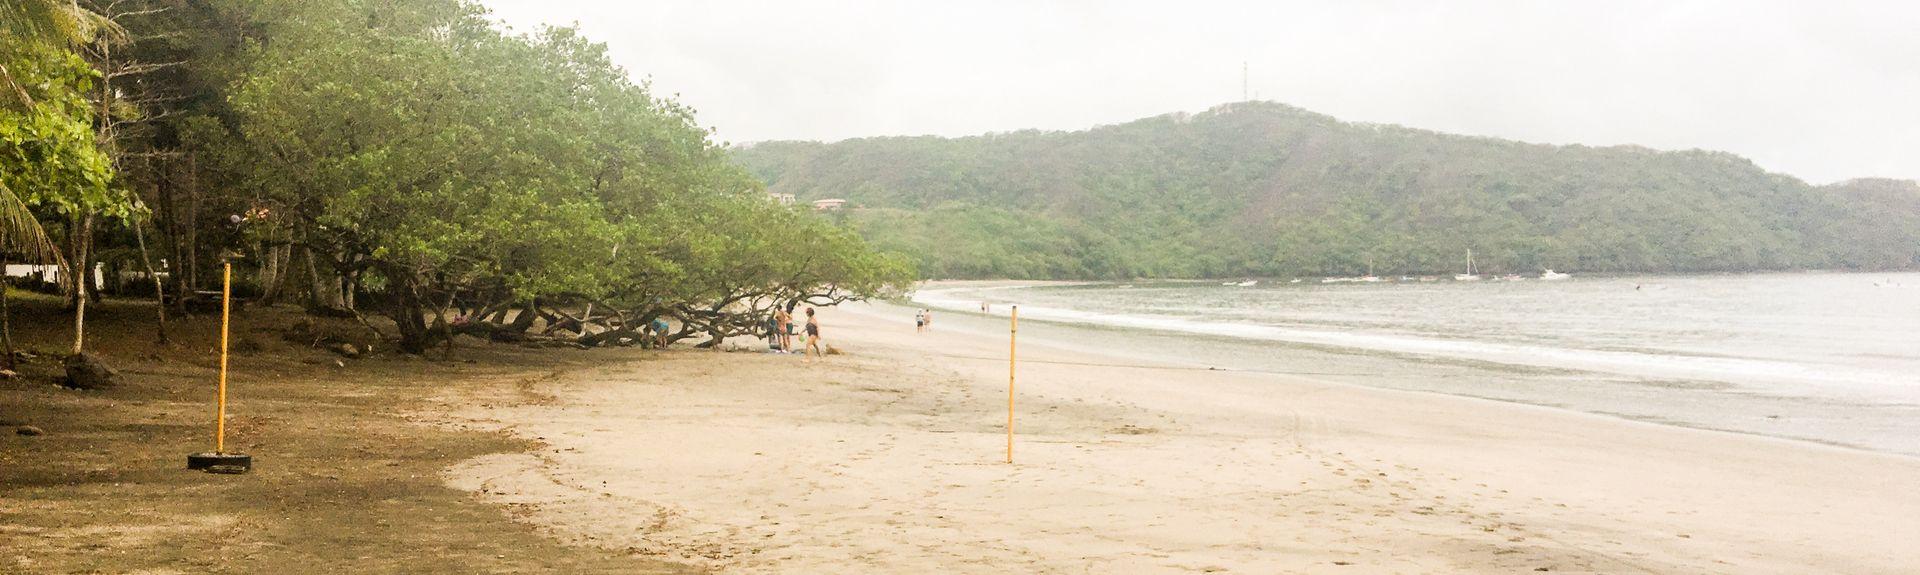 Liberia, Guanacaste, Costa Rica